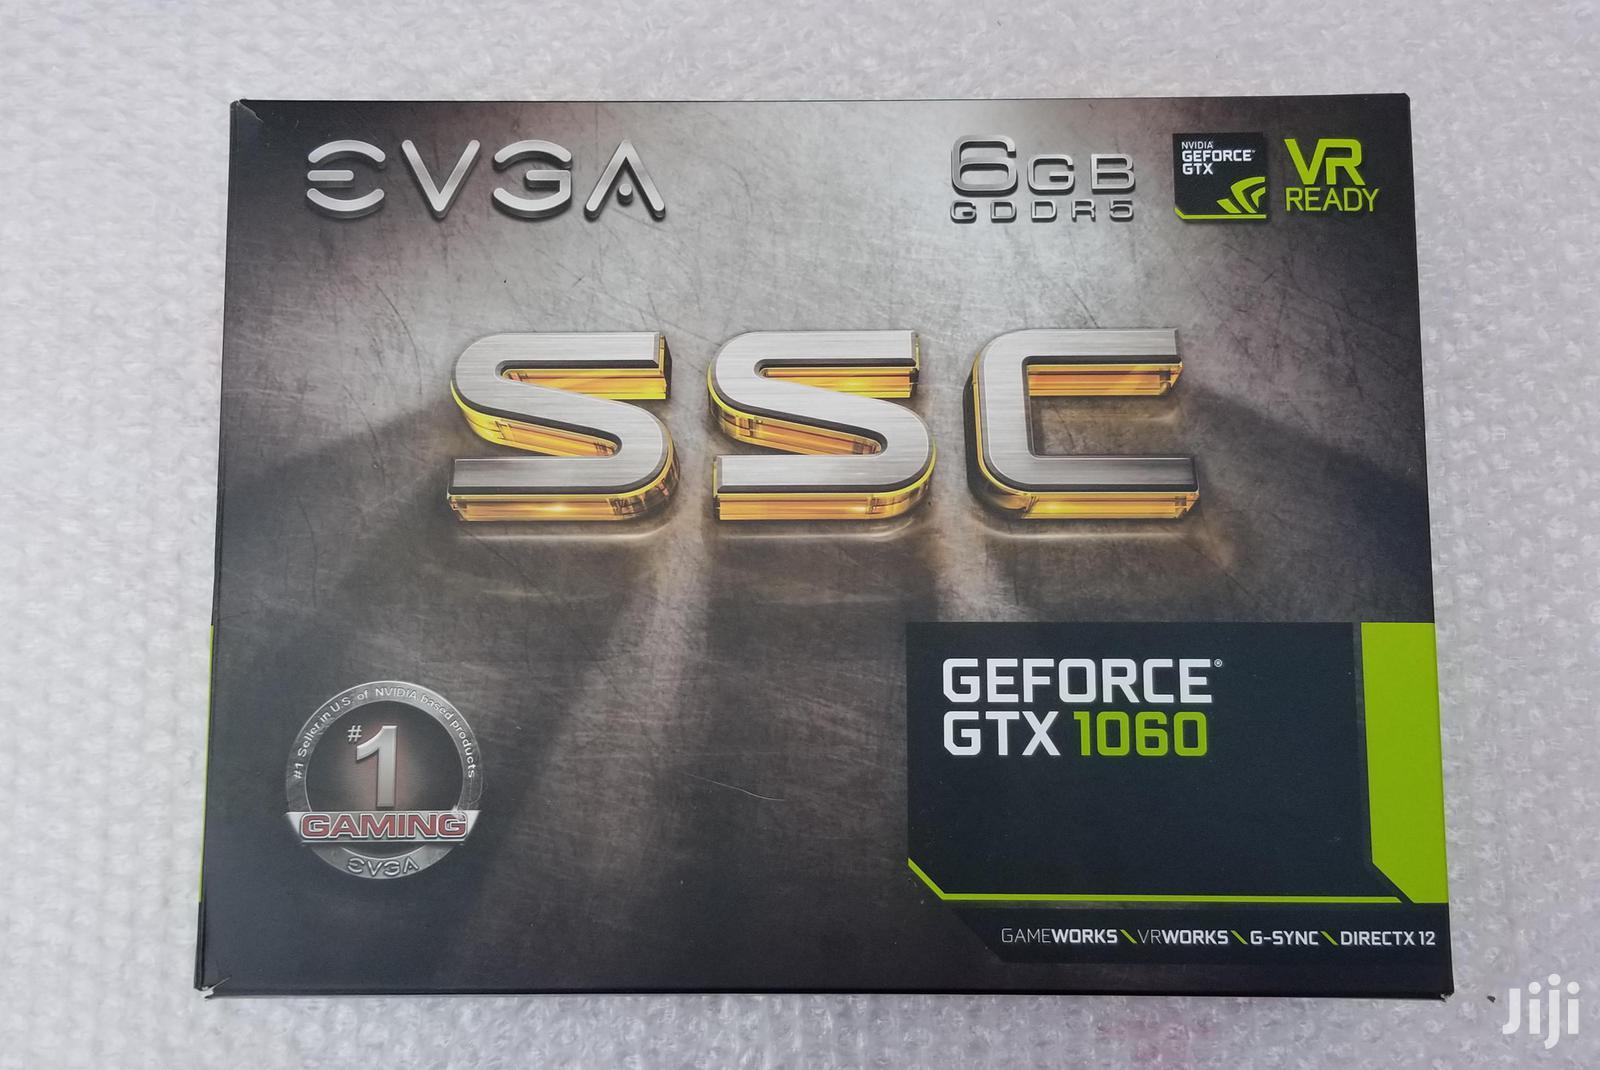 Evga Gtx 1060 6gb Graphic Card